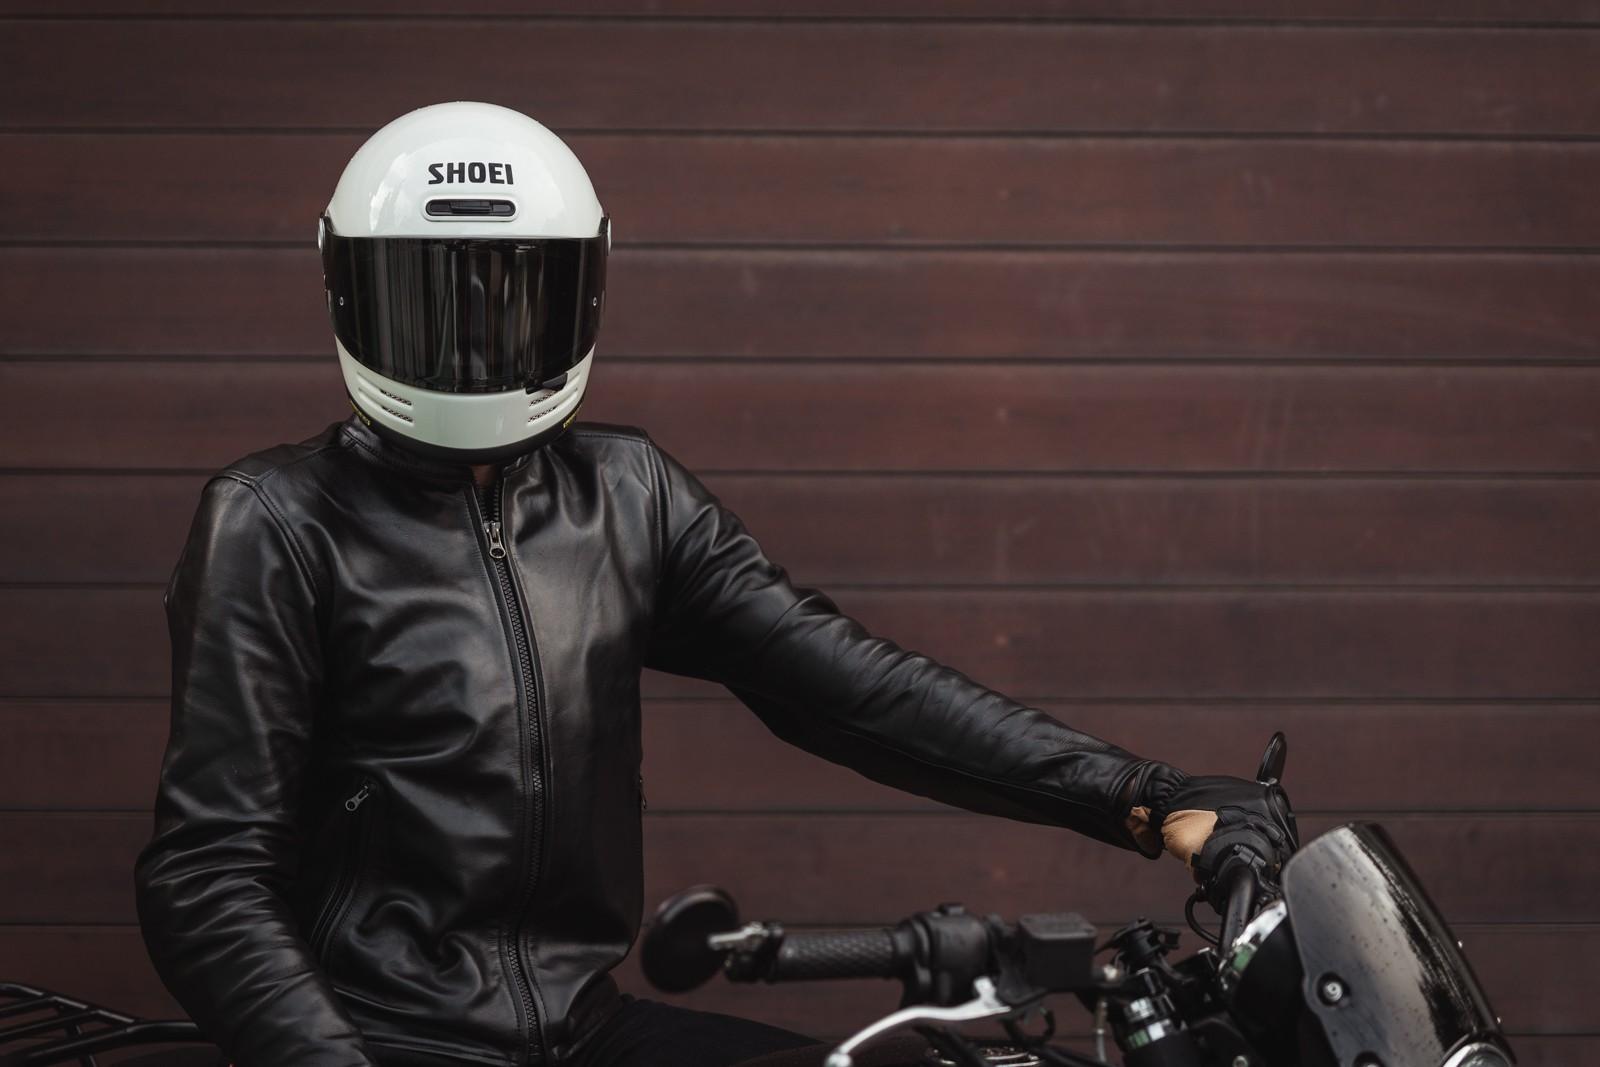 Person wearing Shoei Glamster helmet on motorcycle